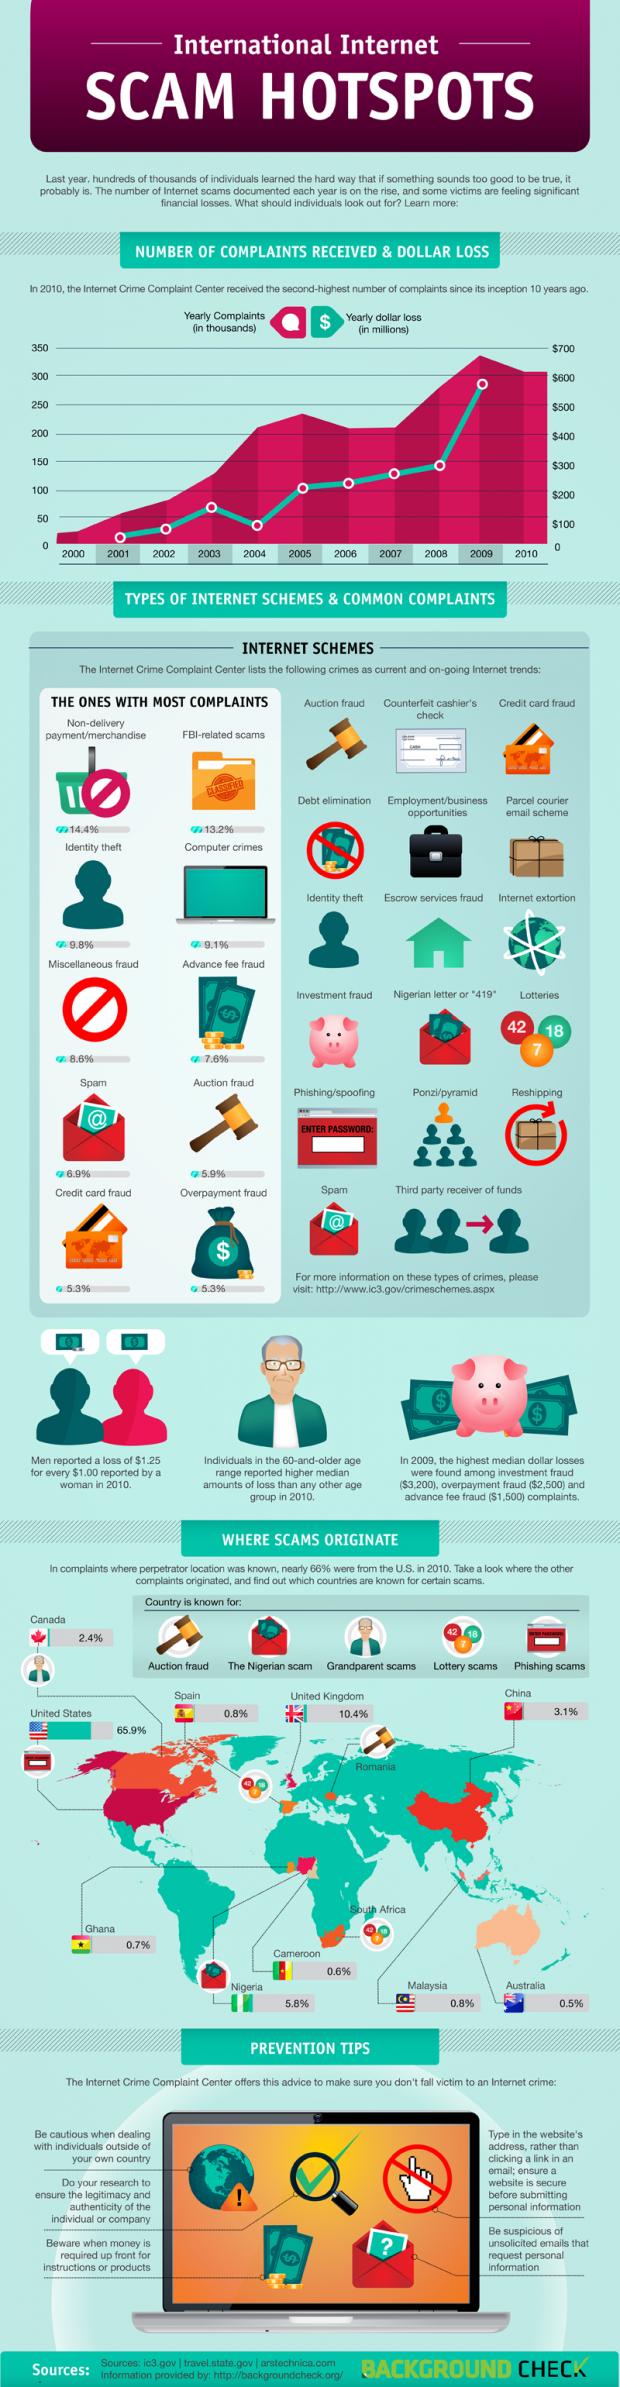 internet scam infographic